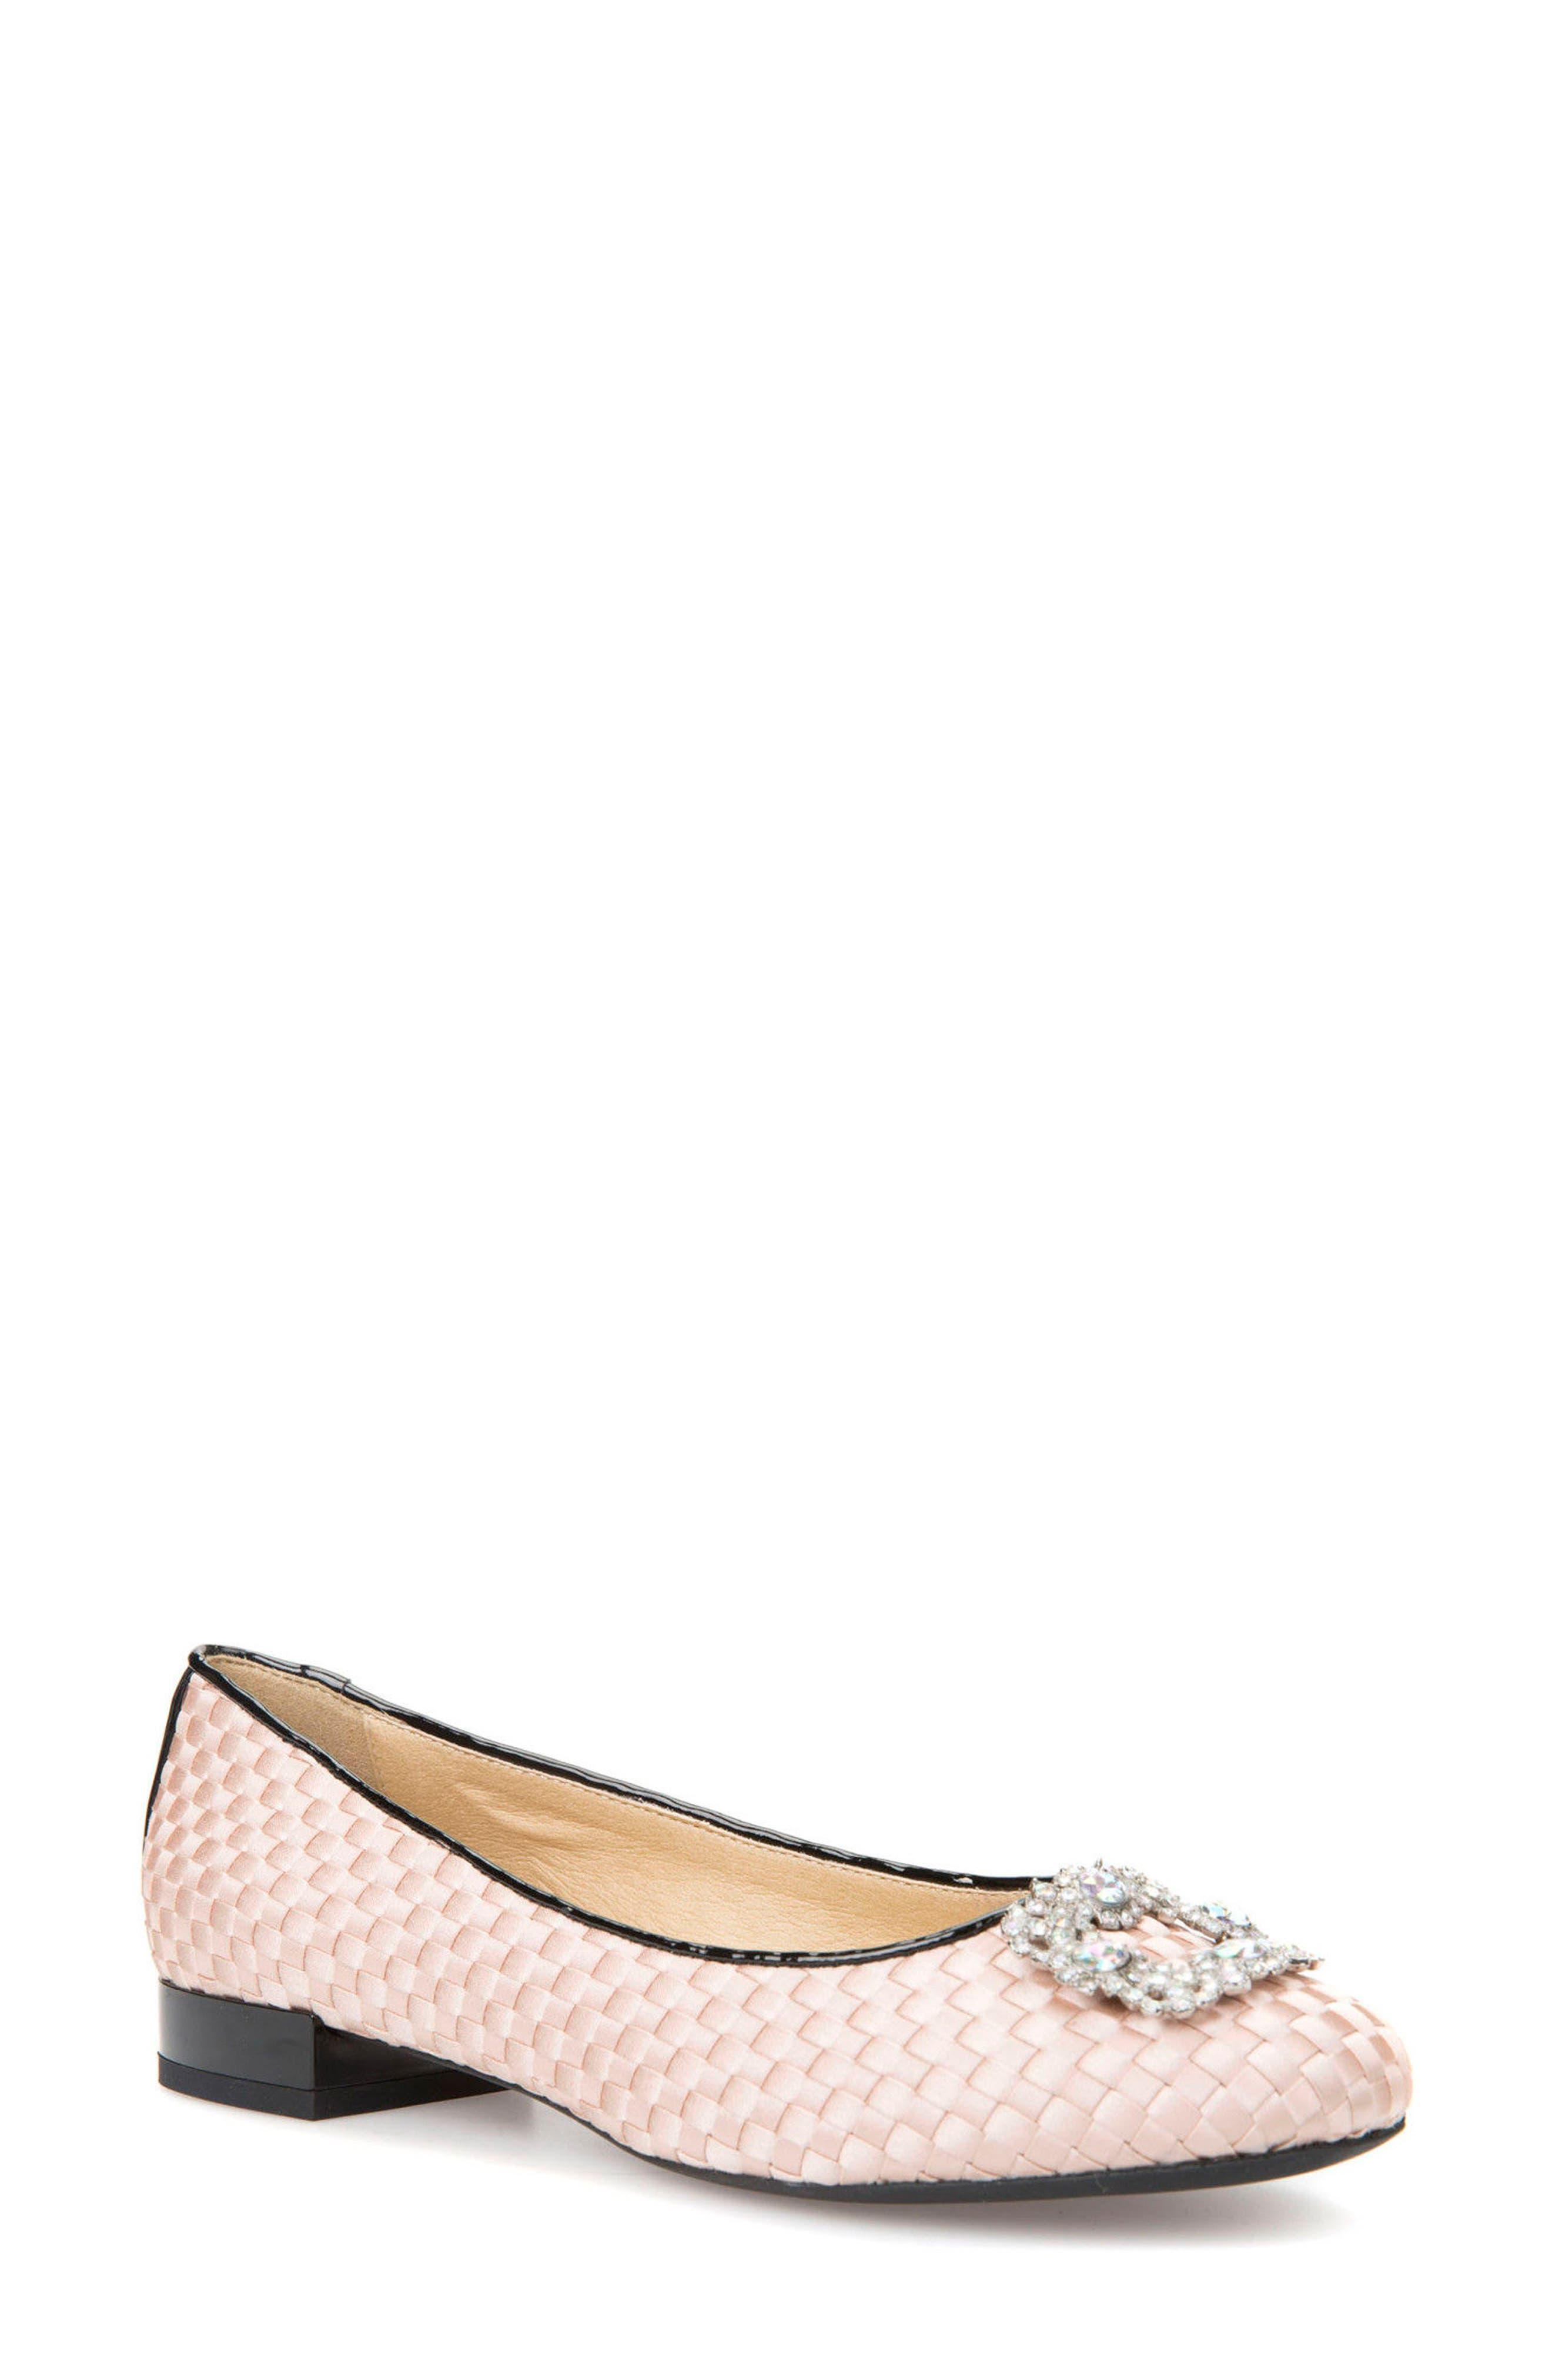 Wistrey Woven Embellished Slip-On,                         Main,                         color, 250